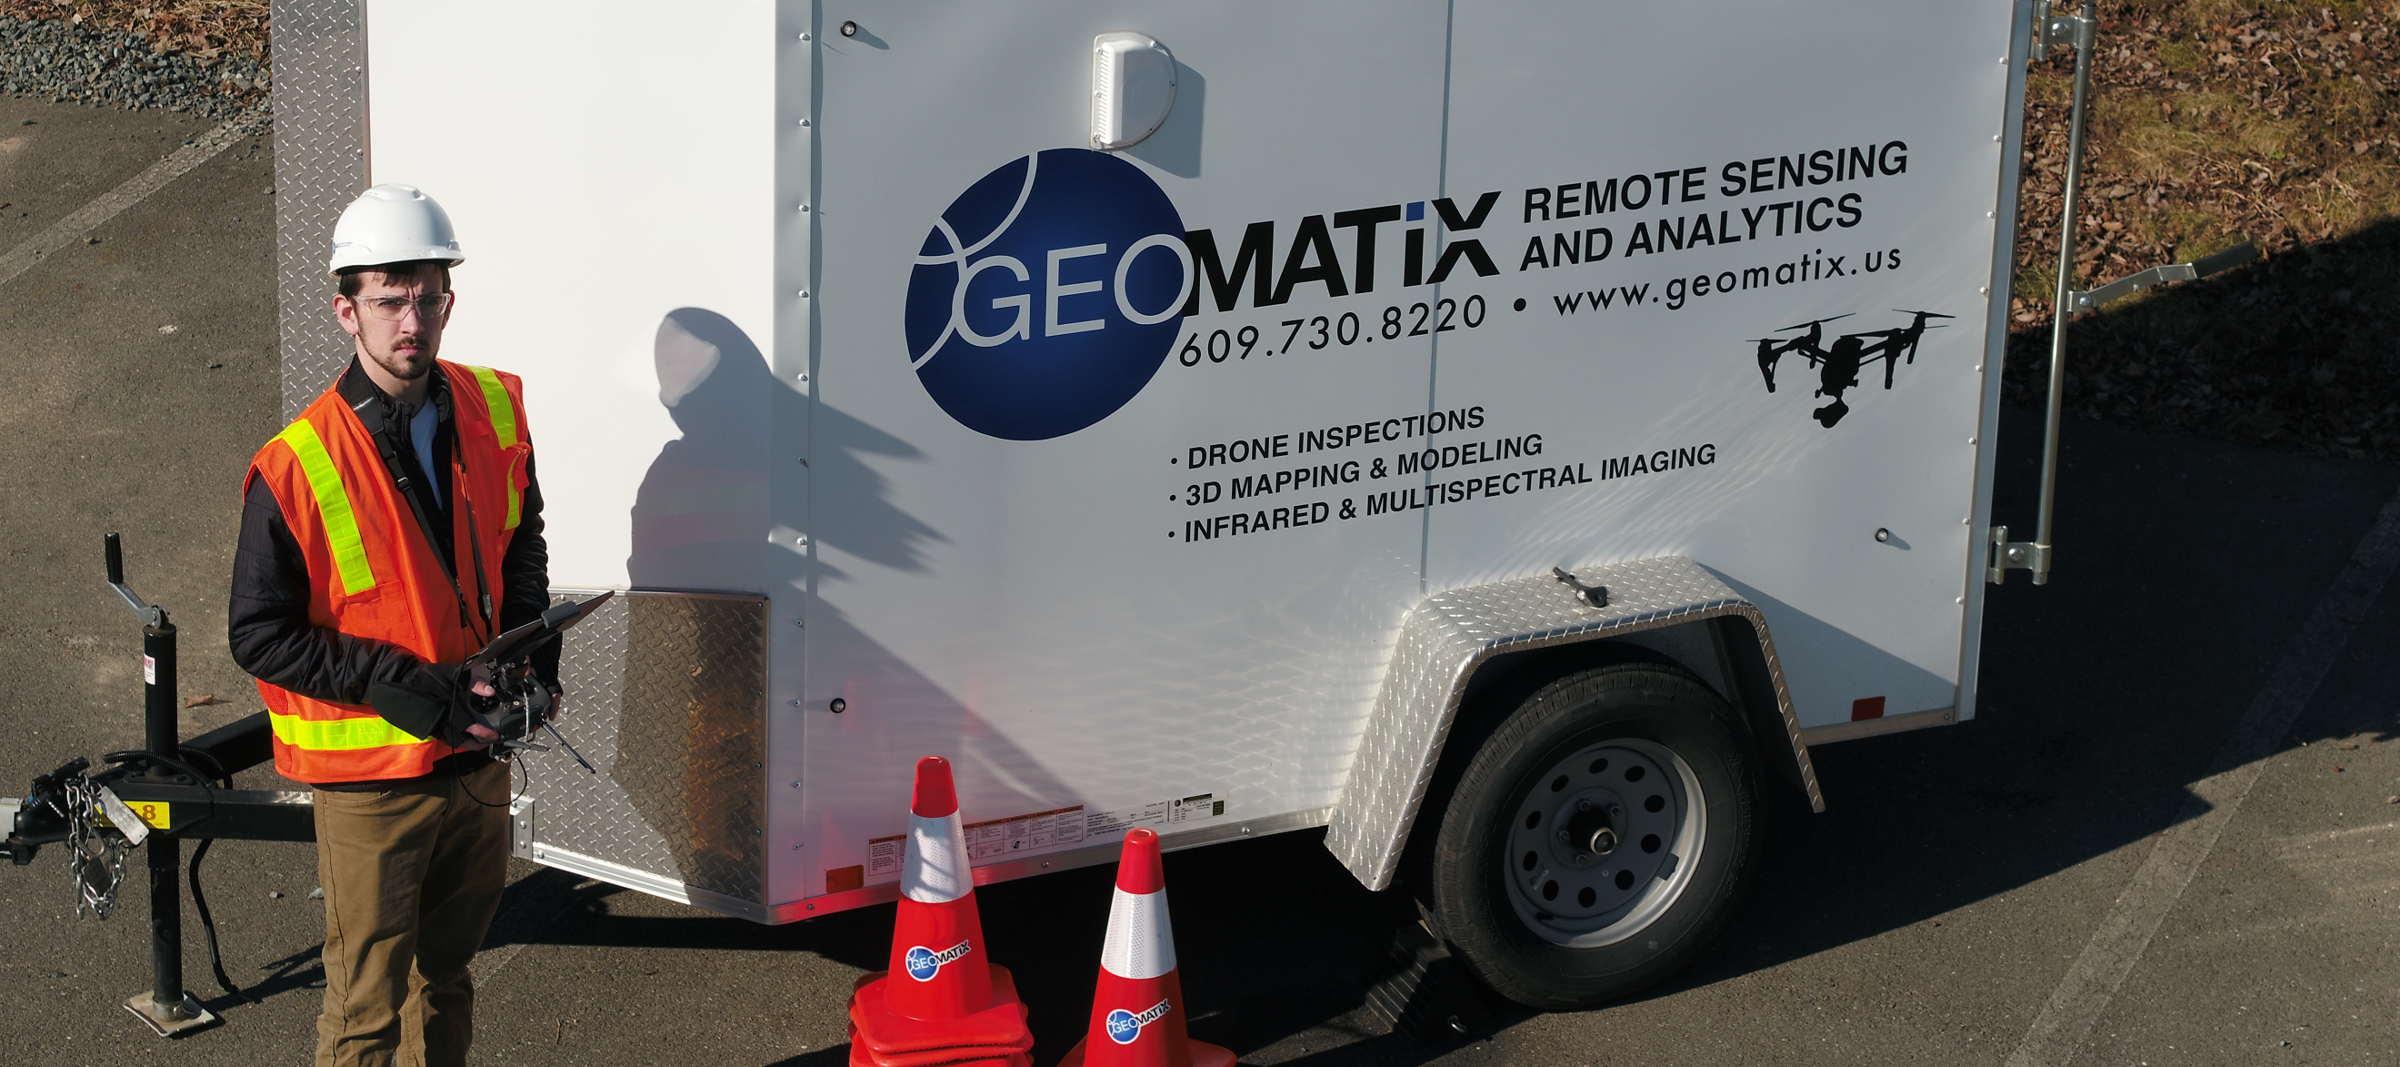 Geomatix PPE & Safety